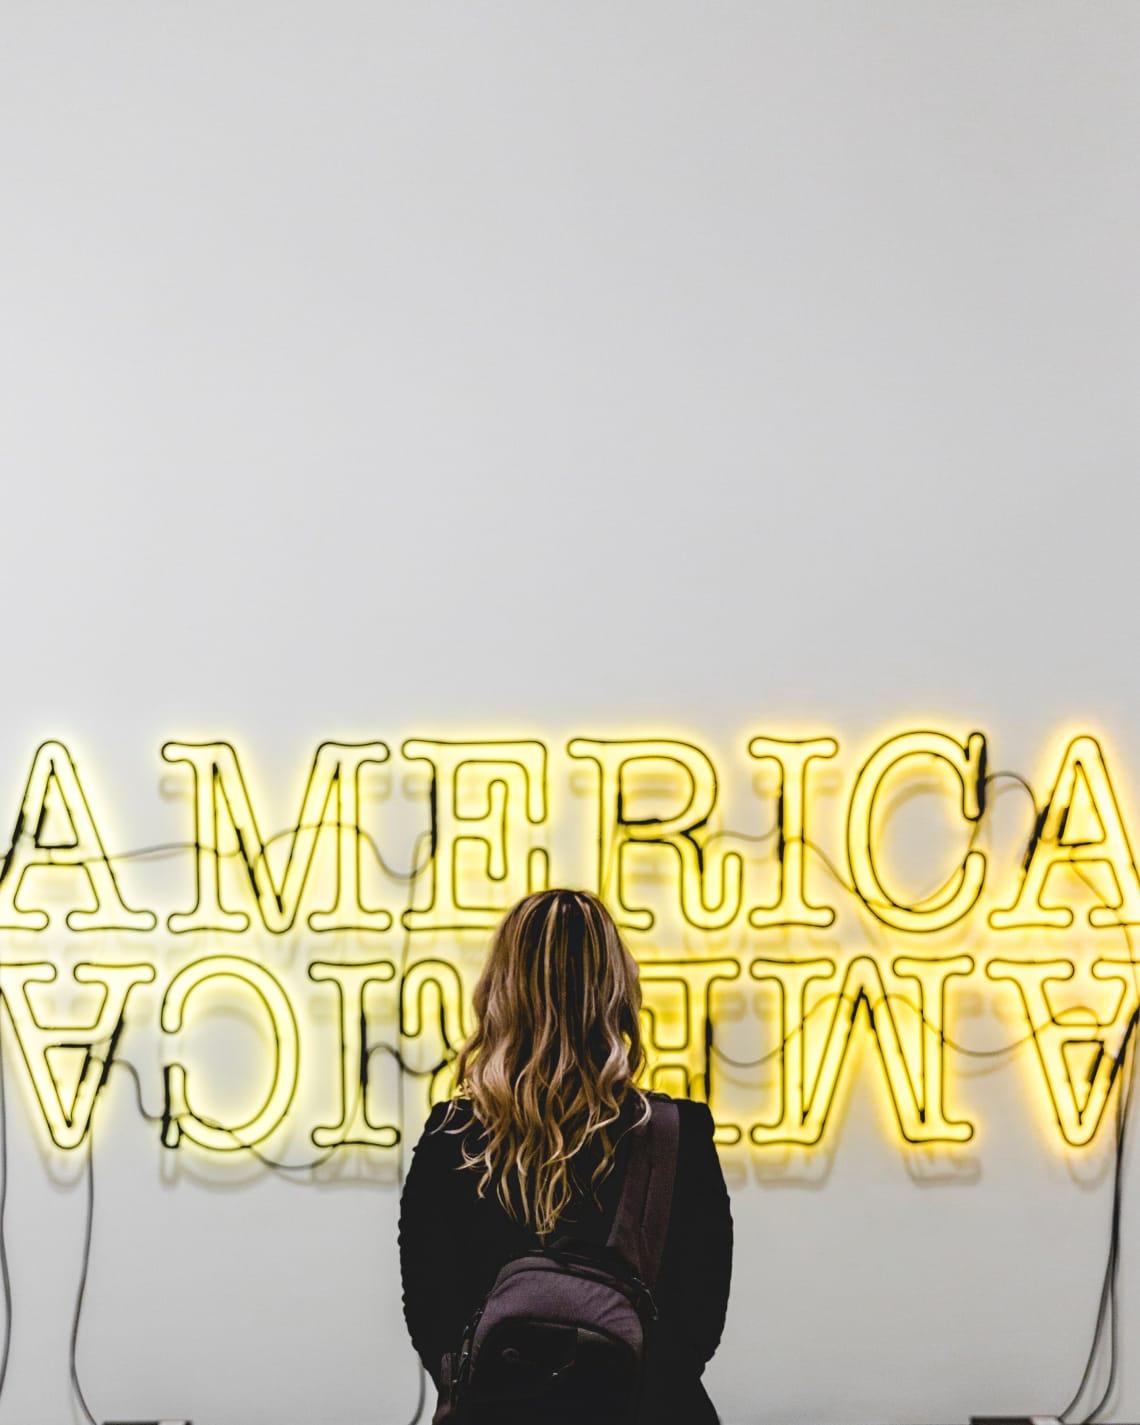 America travel